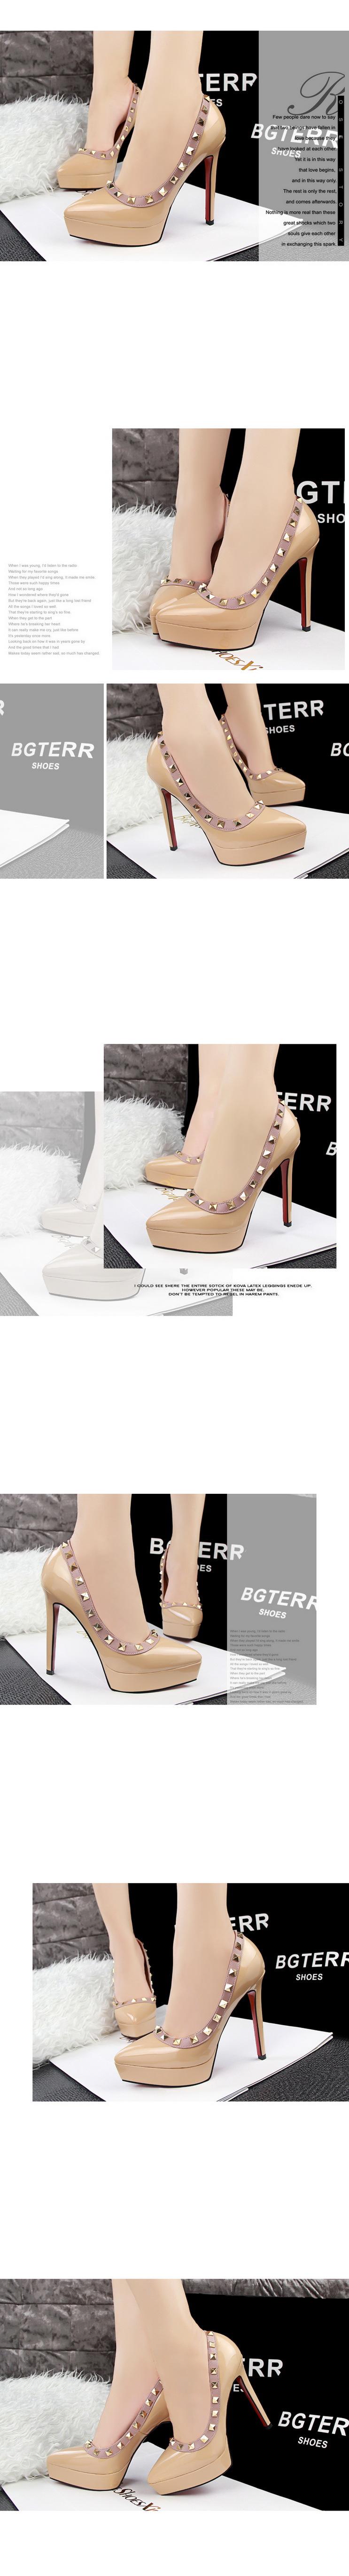 Women Platform Pumps Rivet Shoes Retro High-heel Ladies Rivets Fashion Sexy Club High Heeled Stiletto Pump Chaussure Femme